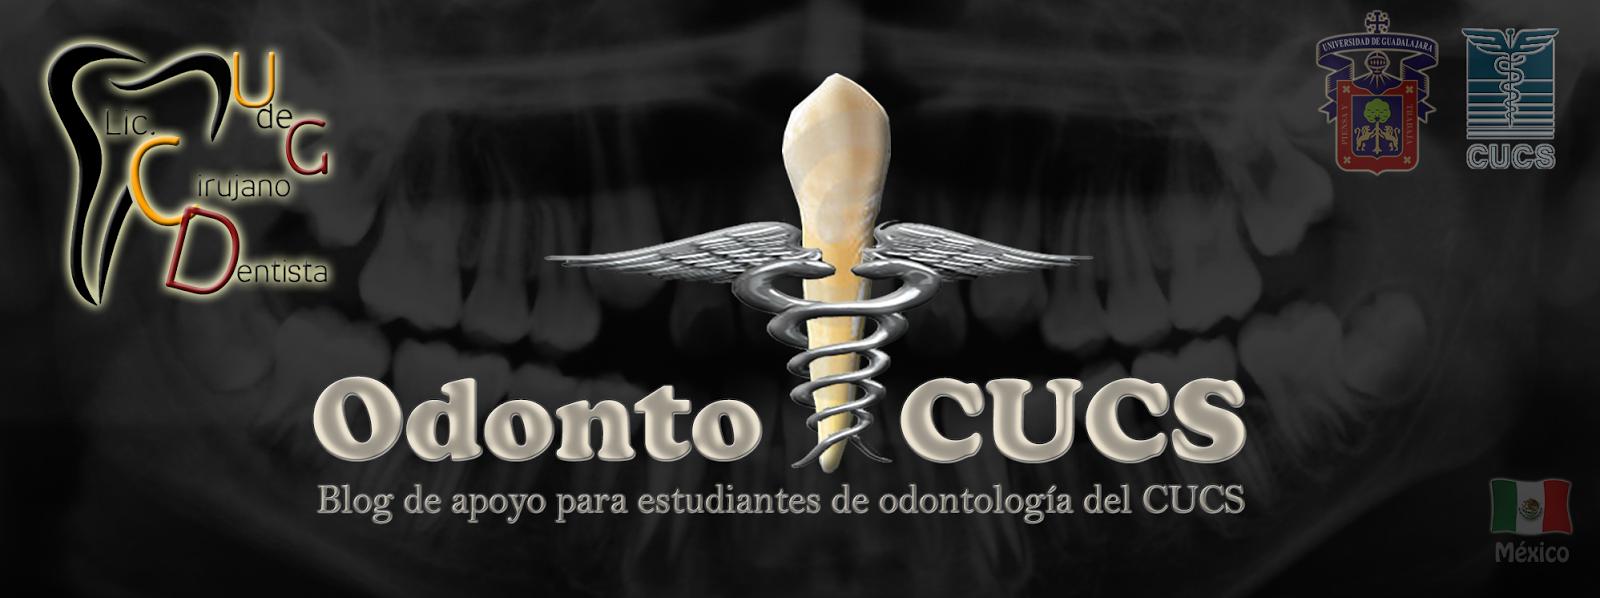 Odonto-CUCS